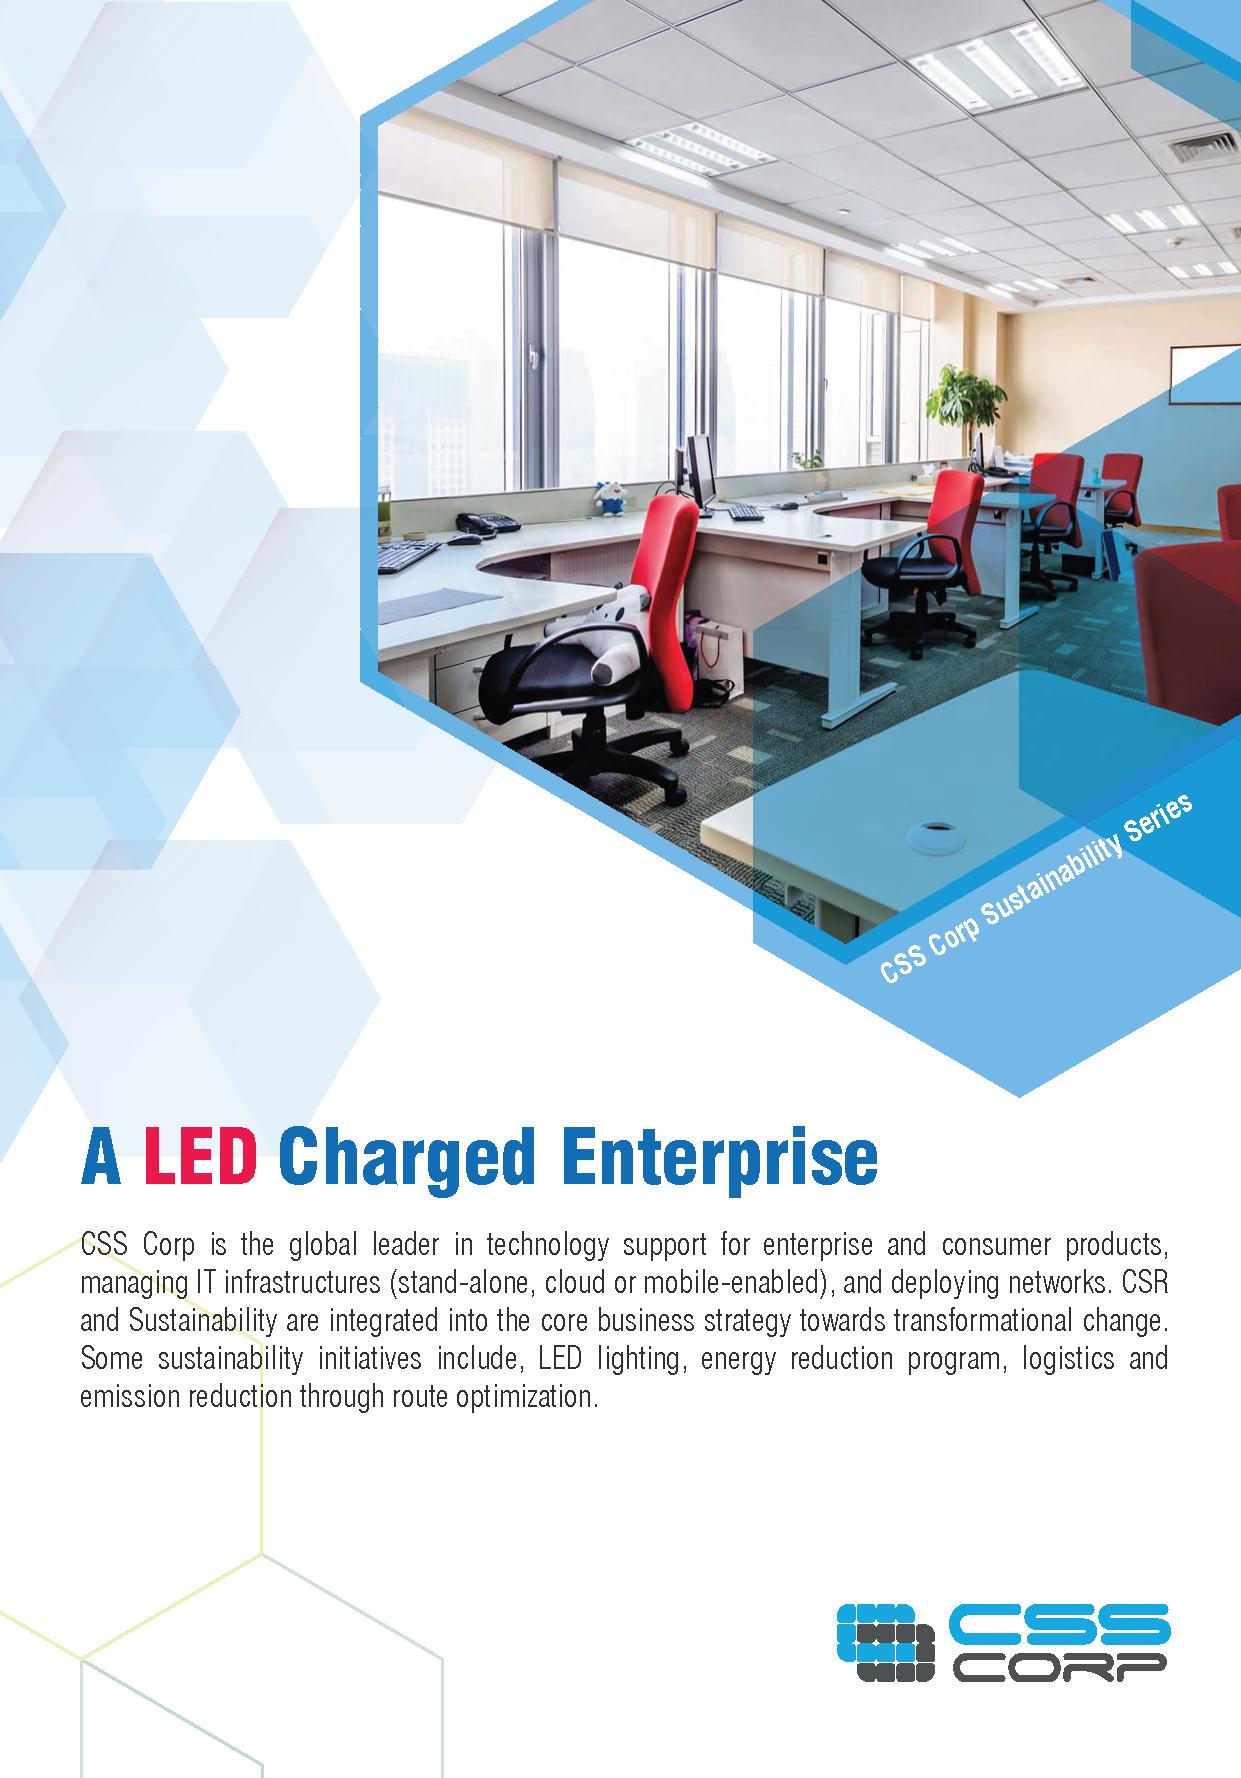 A LED Charged Enterprise